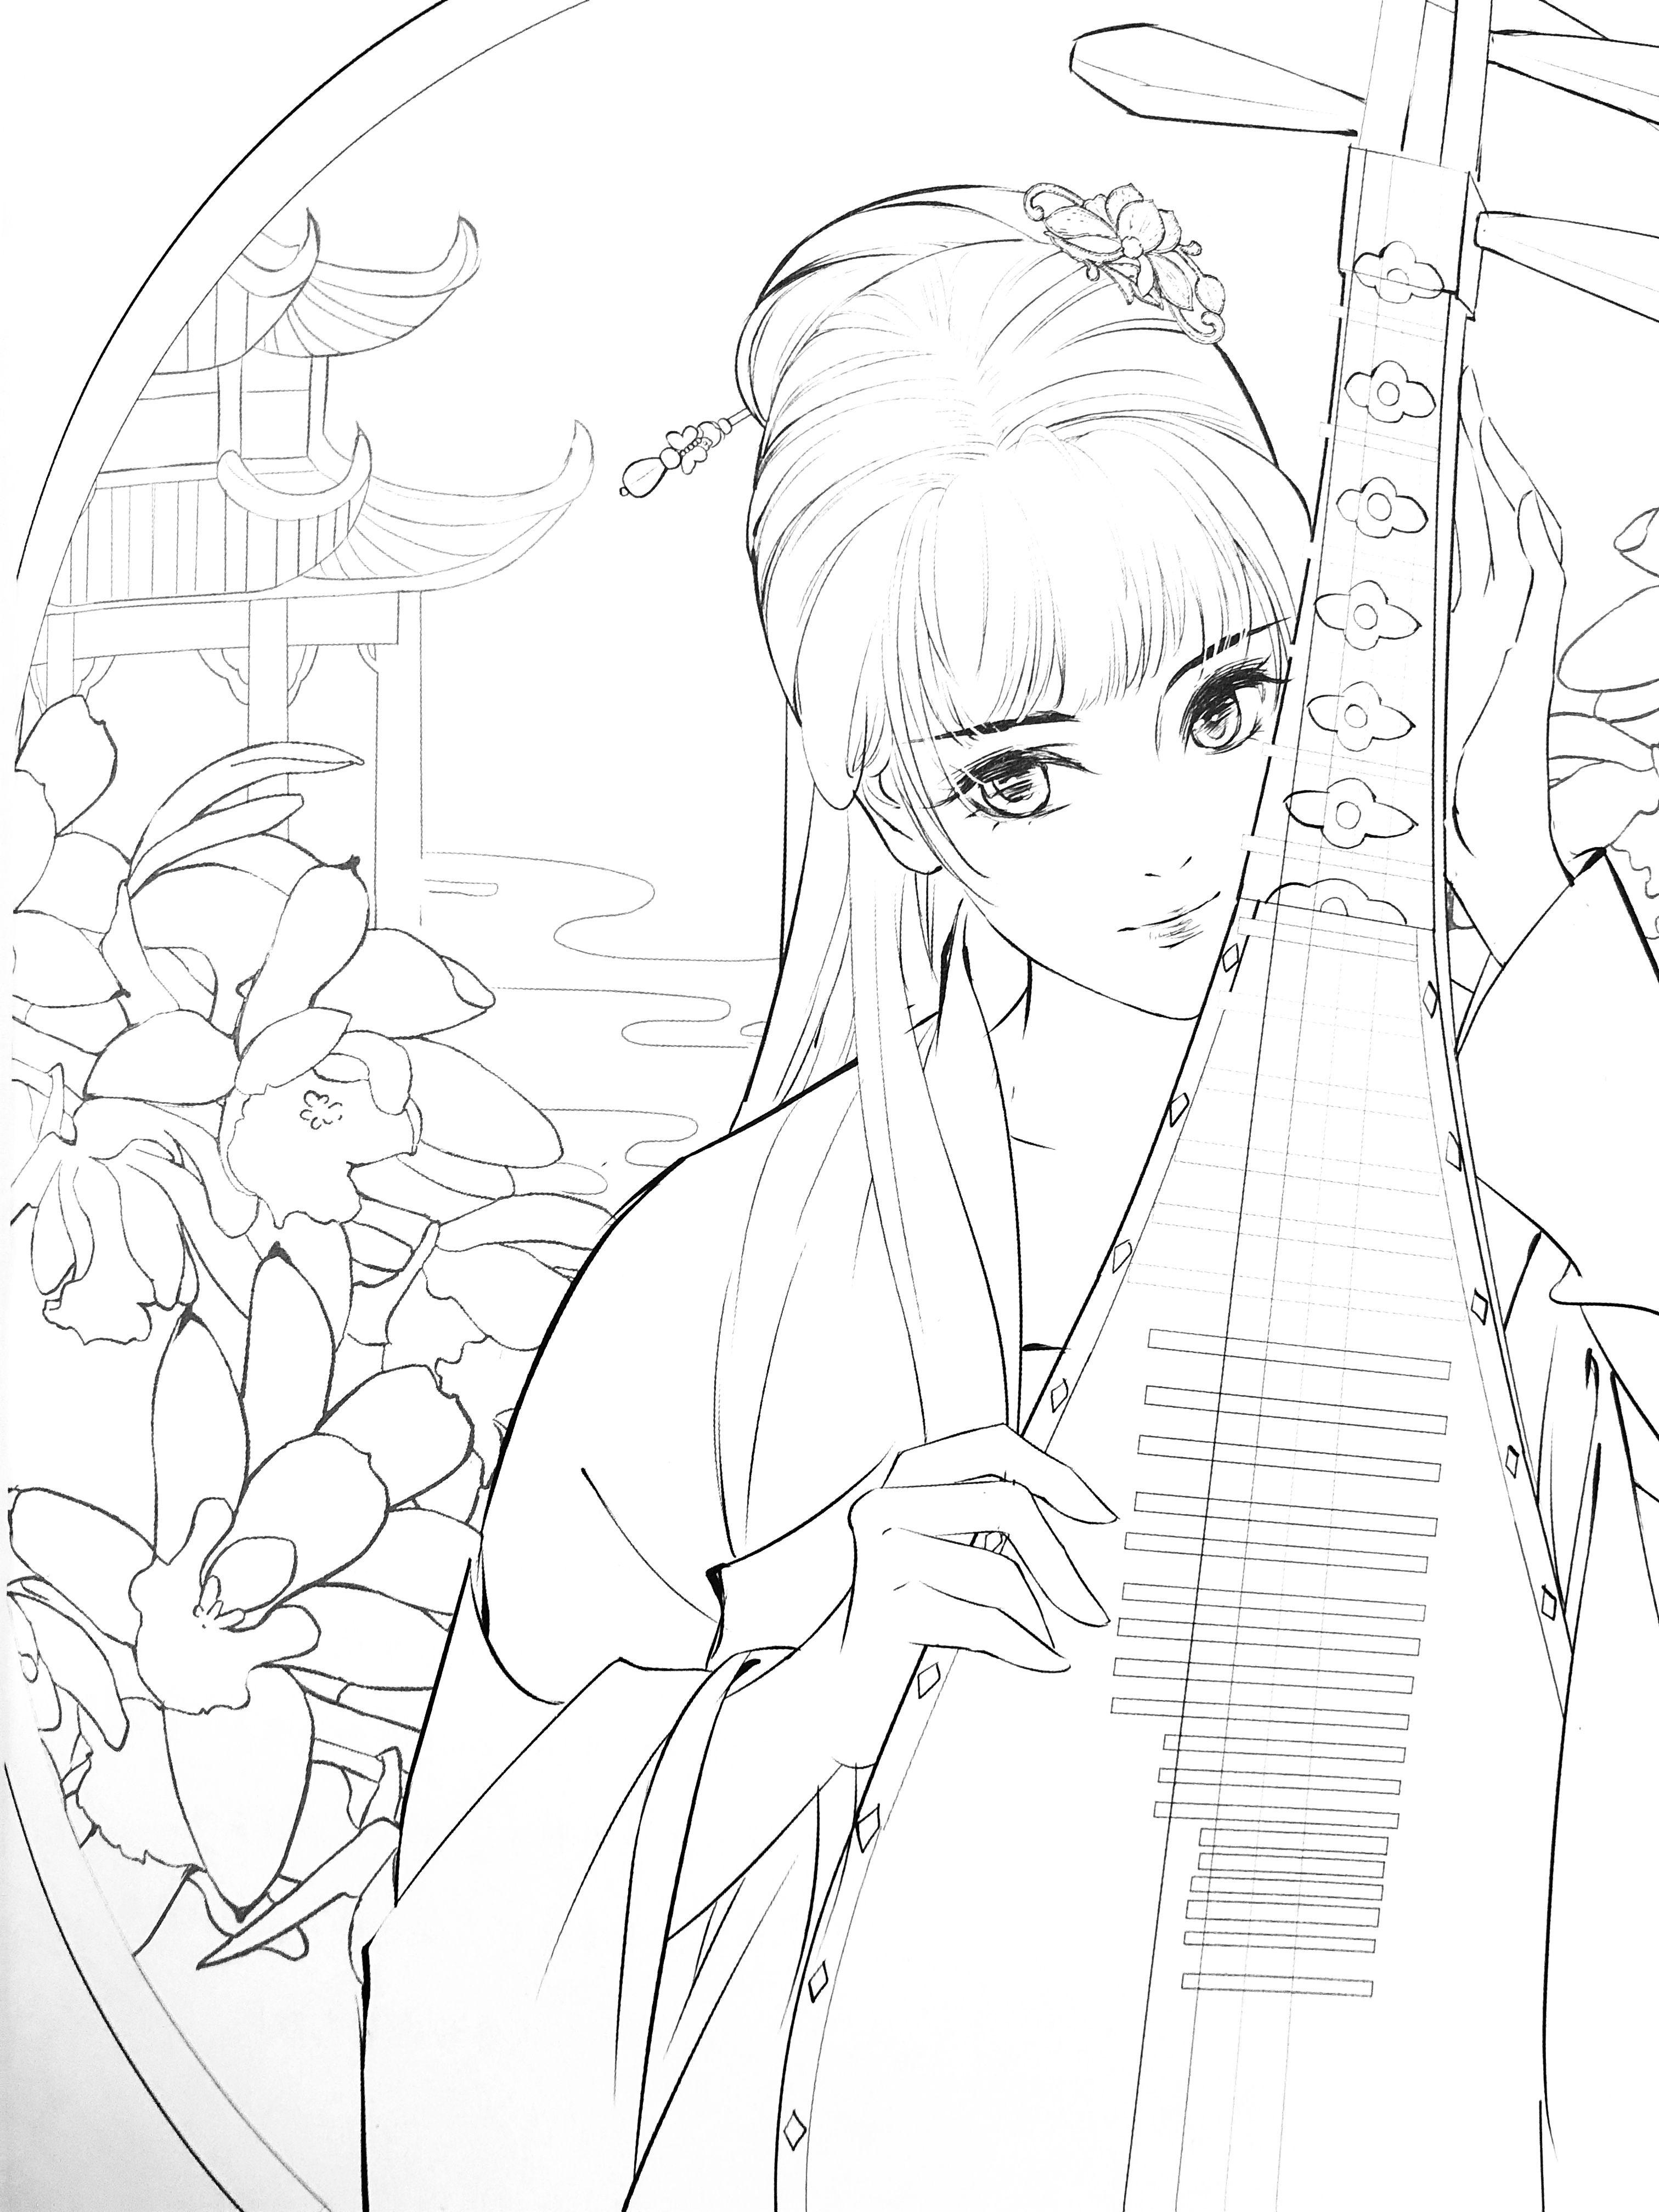 Qingpingyue Chinese Coloring Book Etsy Mỹ Thuật Y Tưởng Vẽ Anime [ 4032 x 3024 Pixel ]